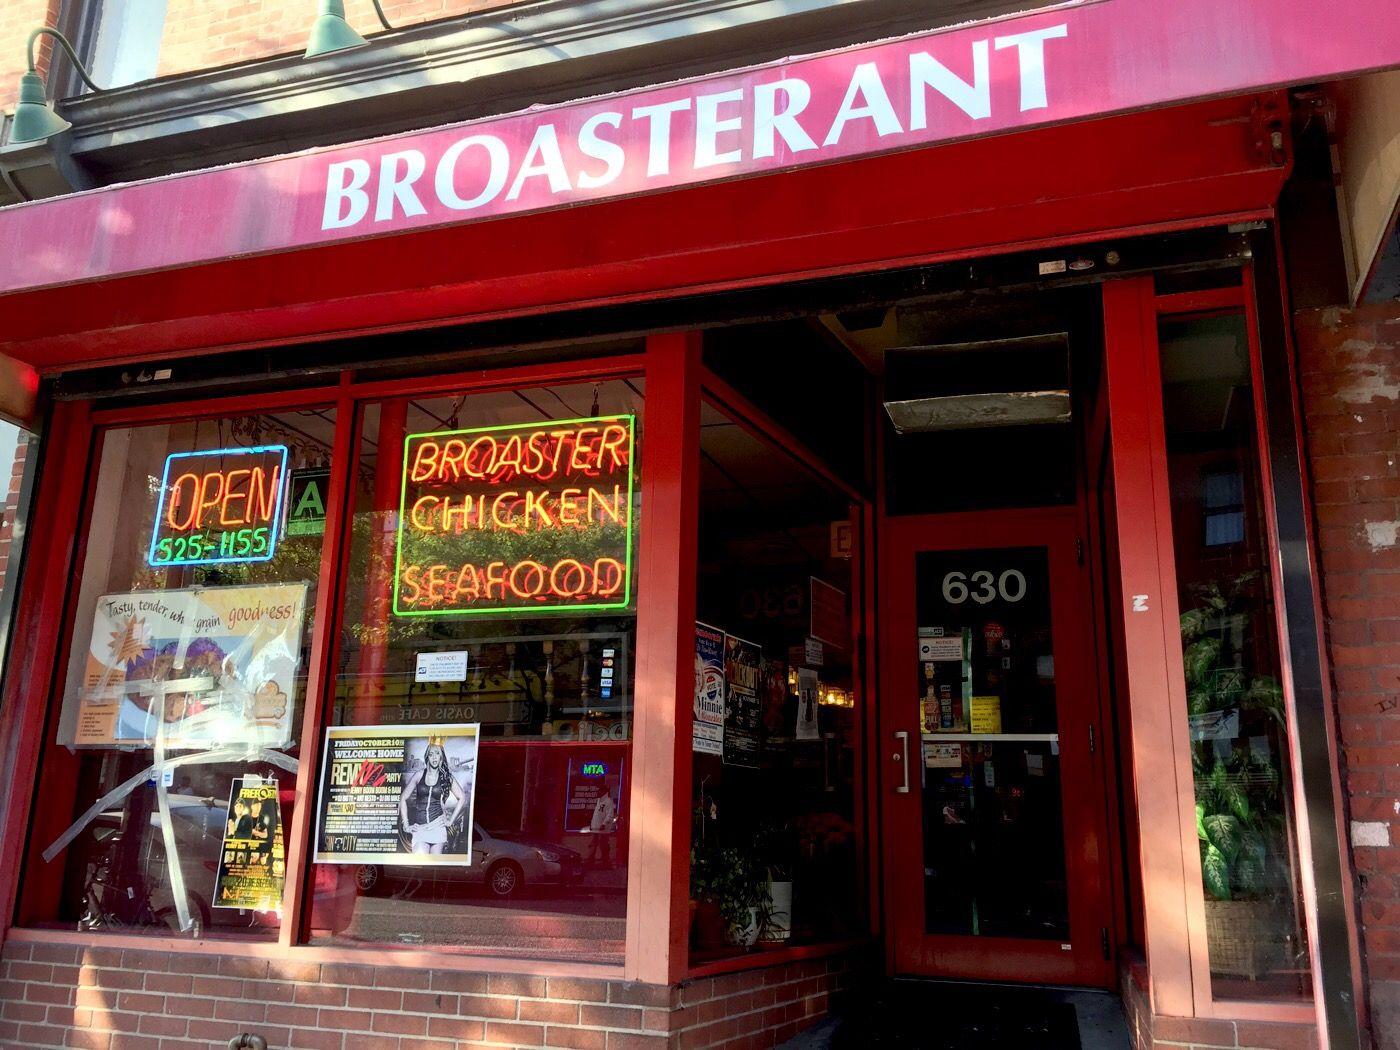 Broasterant Fried En Restaurant